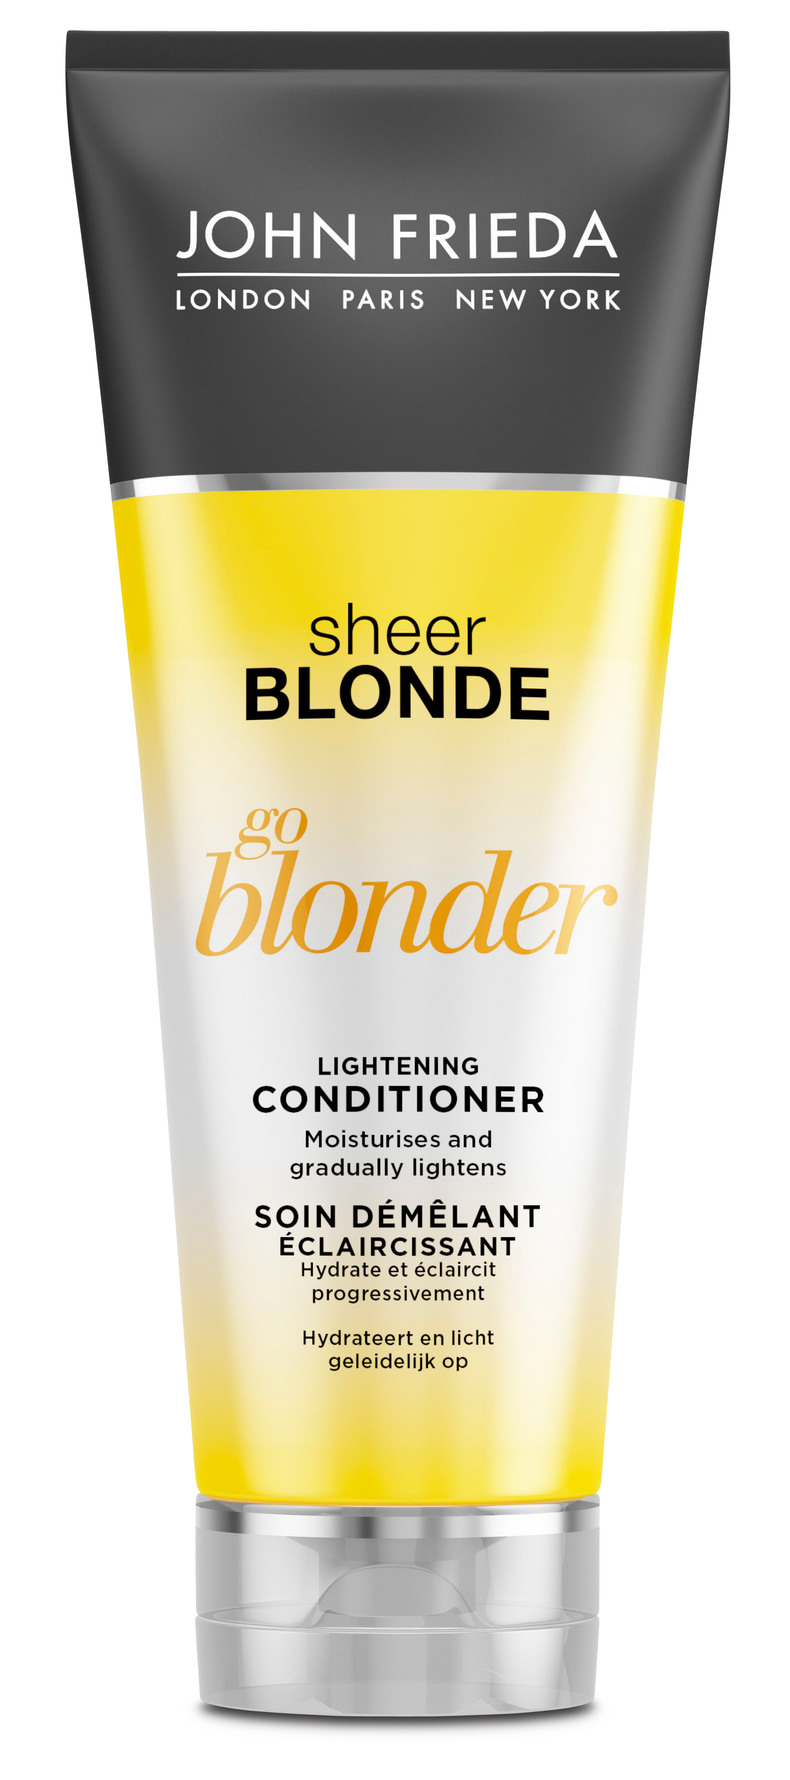 shampoo der lysner håret